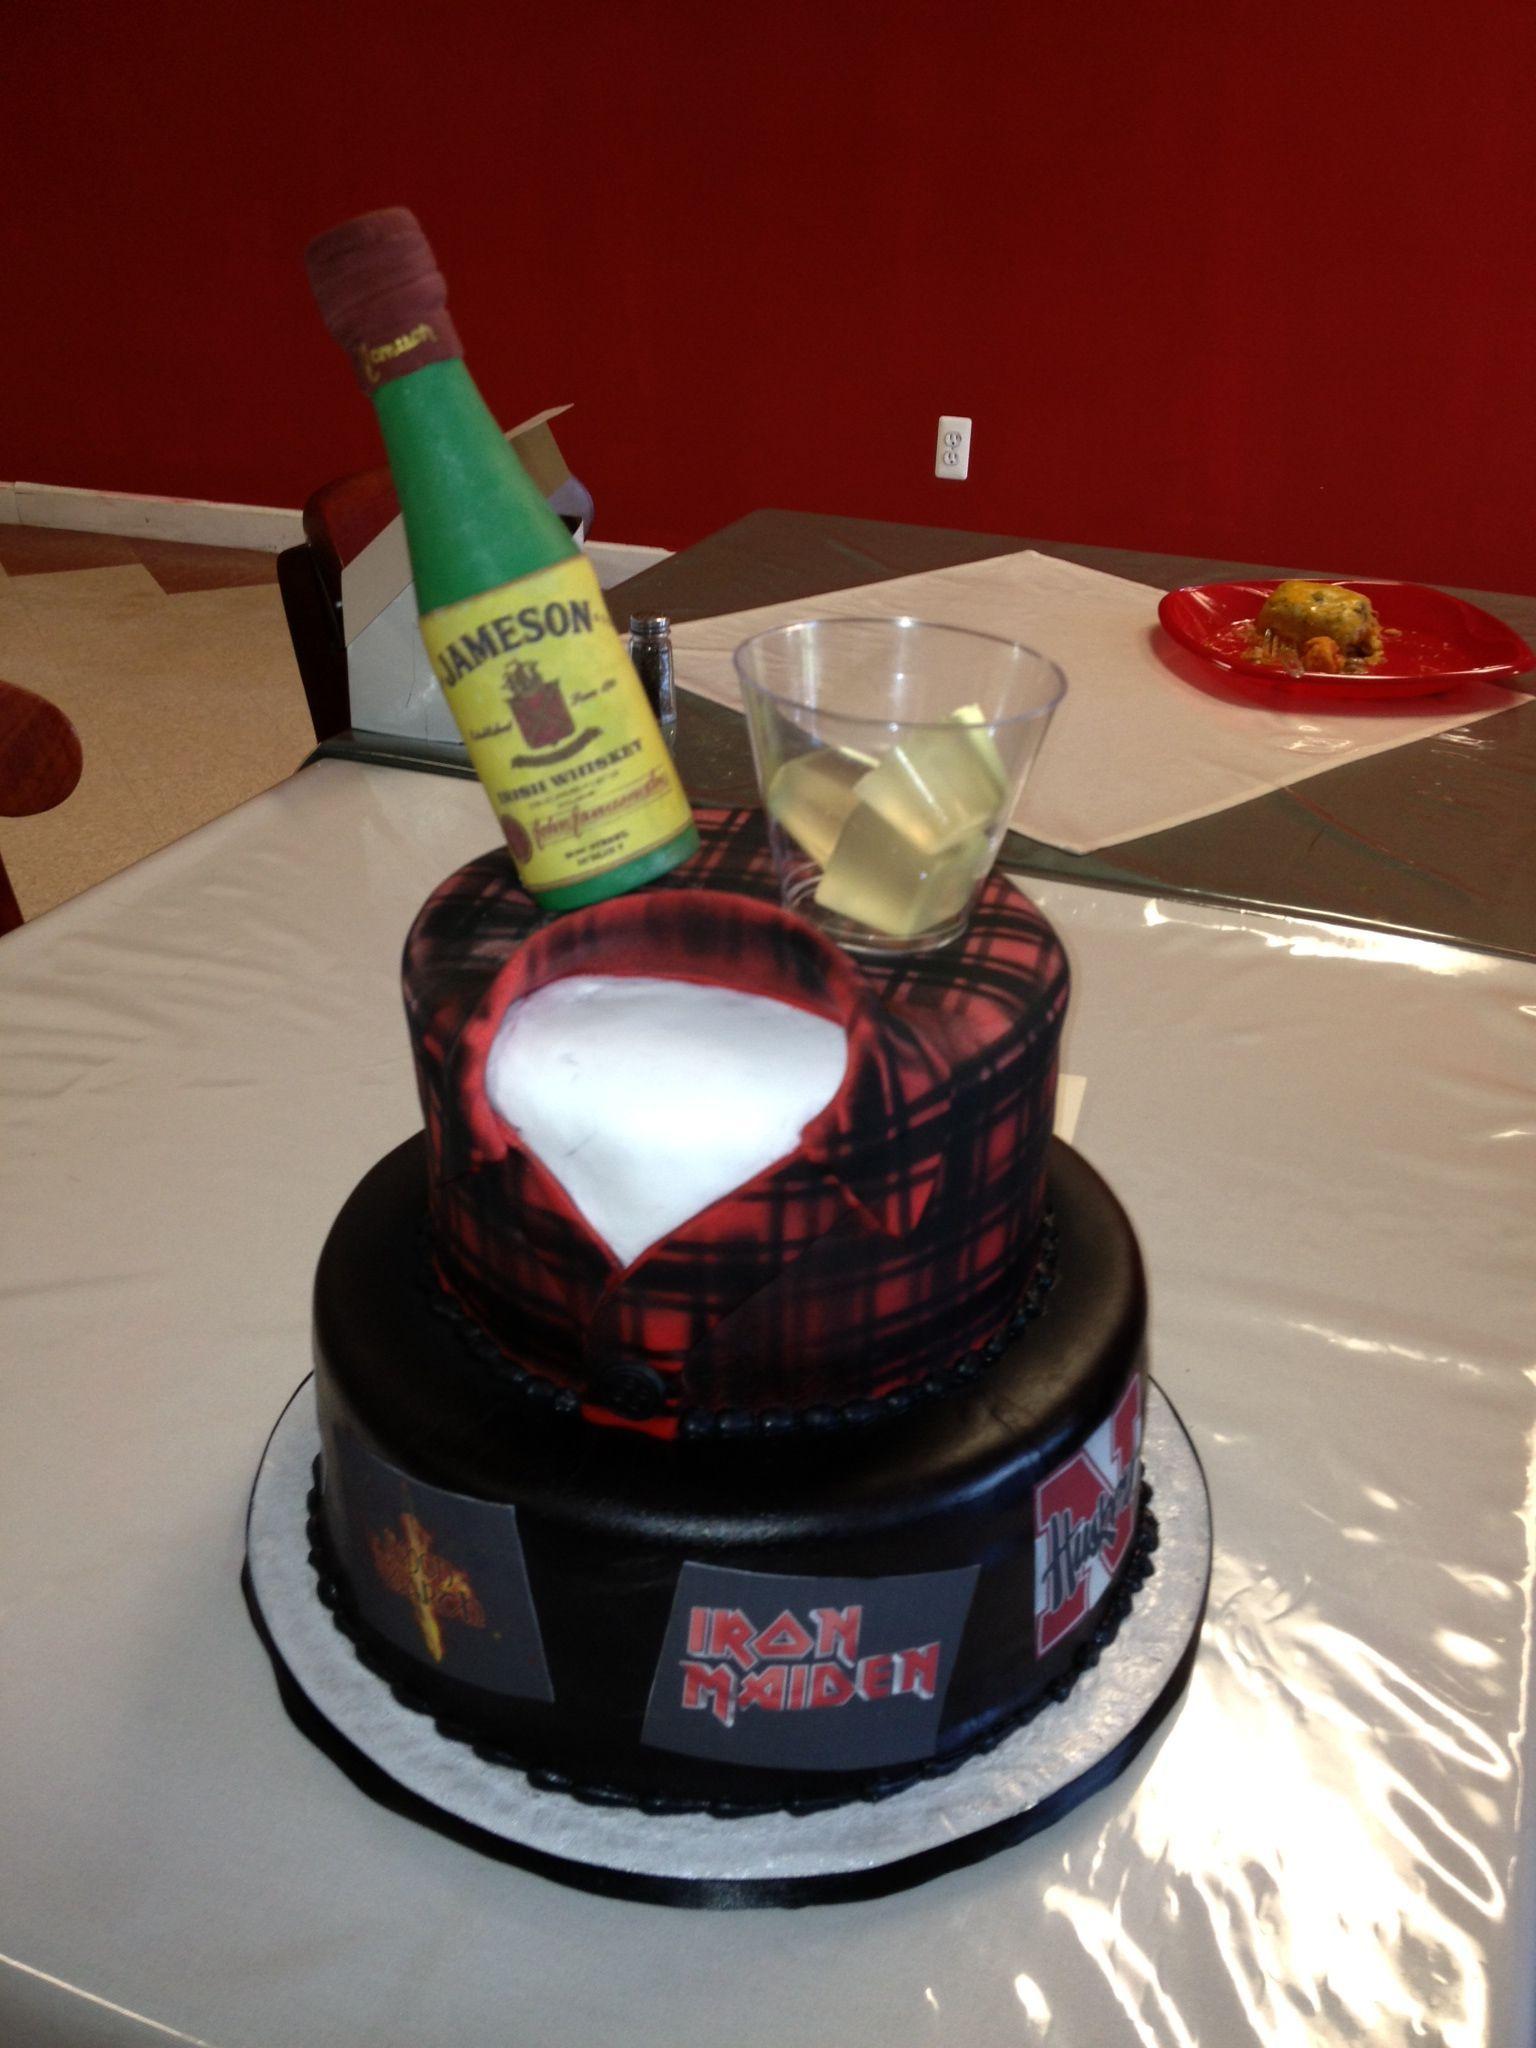 25 Wonderful Photo Of Birthday Cakes For Guys Pin Jennicakes On Pinterest Guy